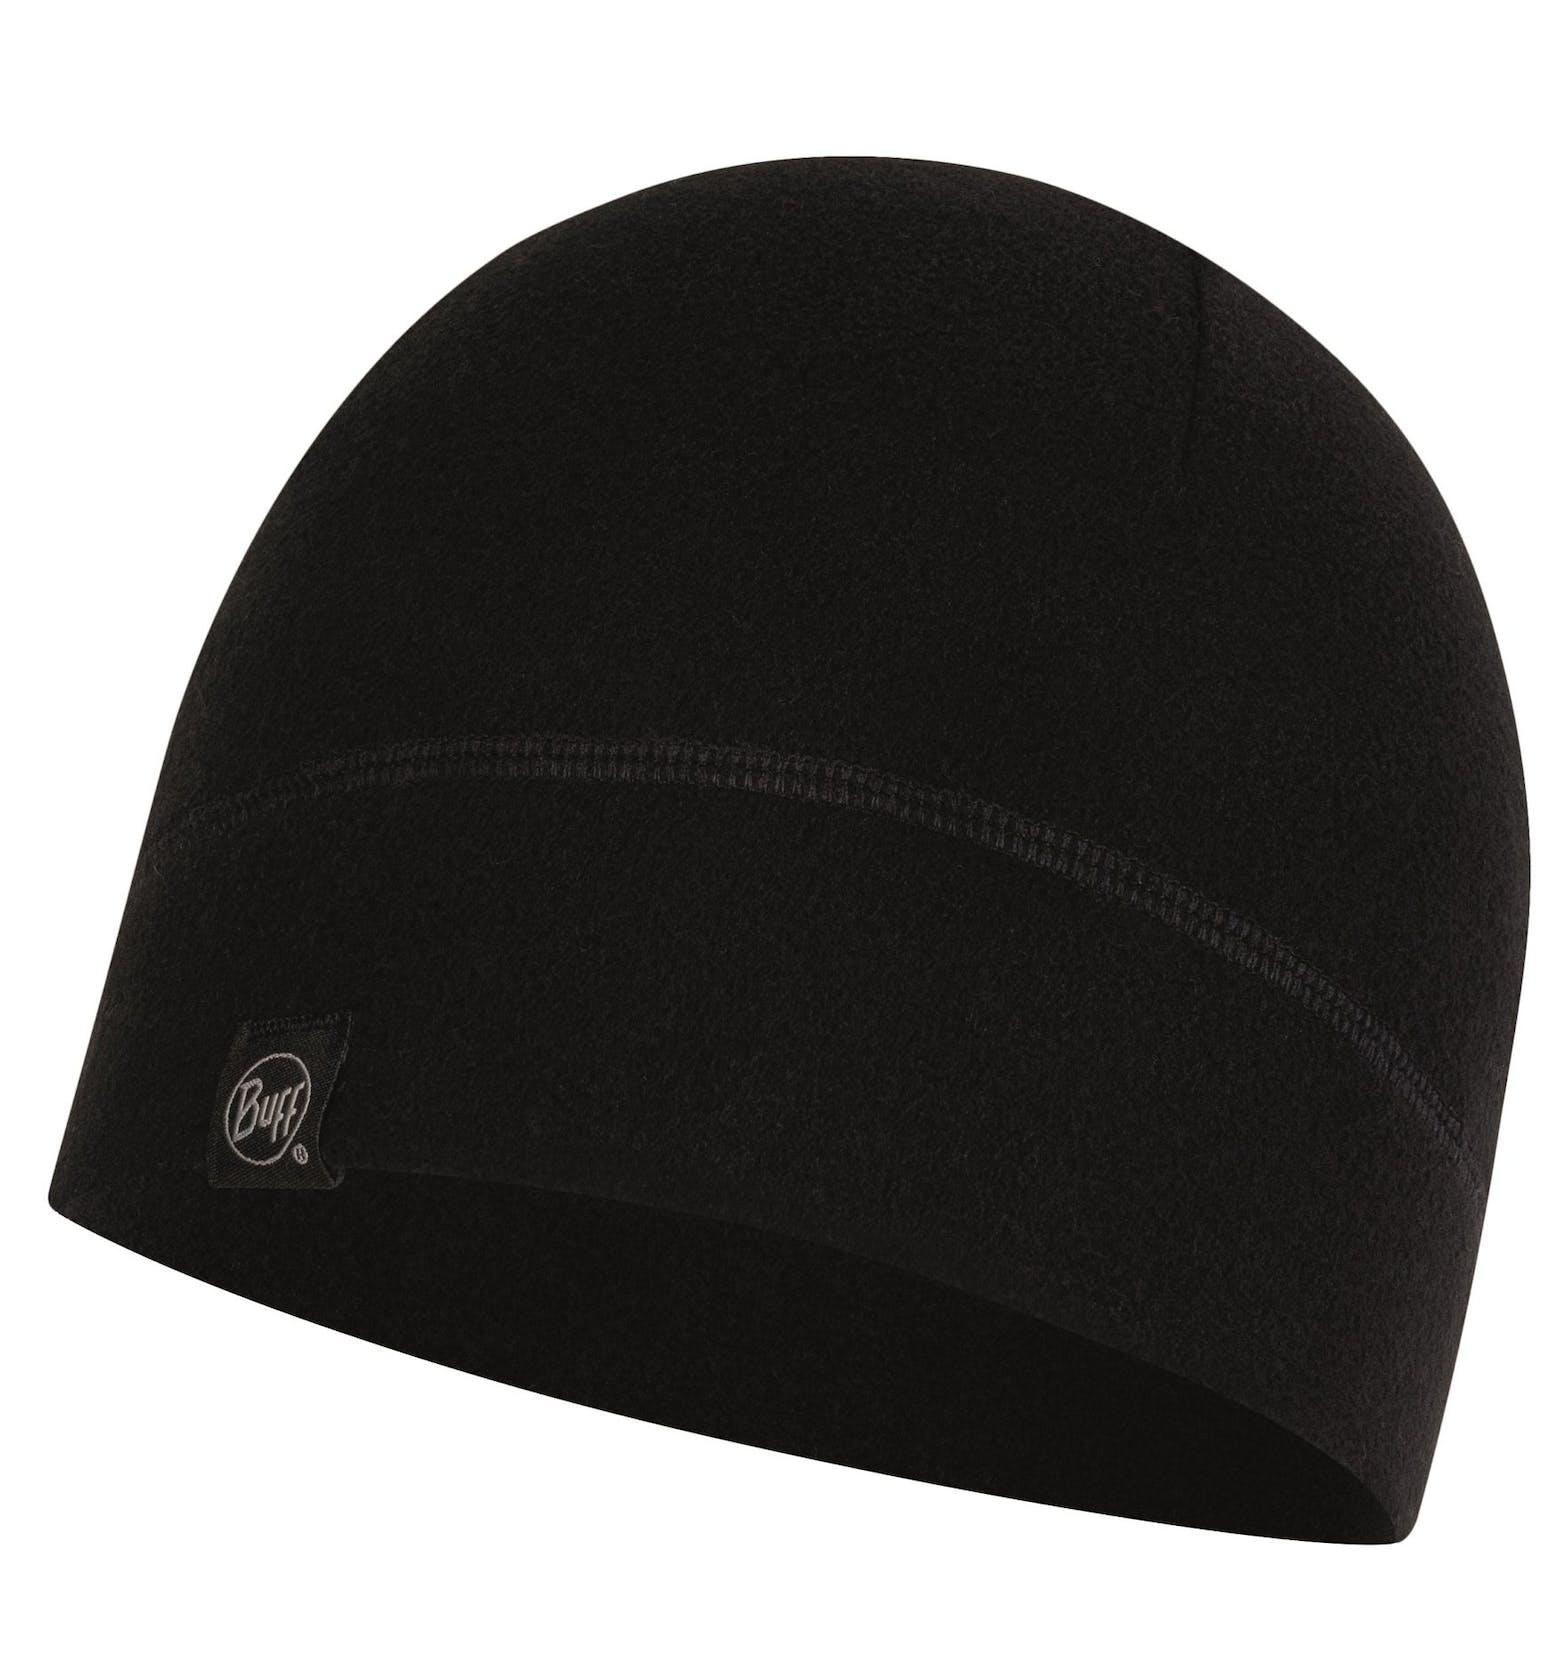 Polar Buff - Halswärmer und Mütze